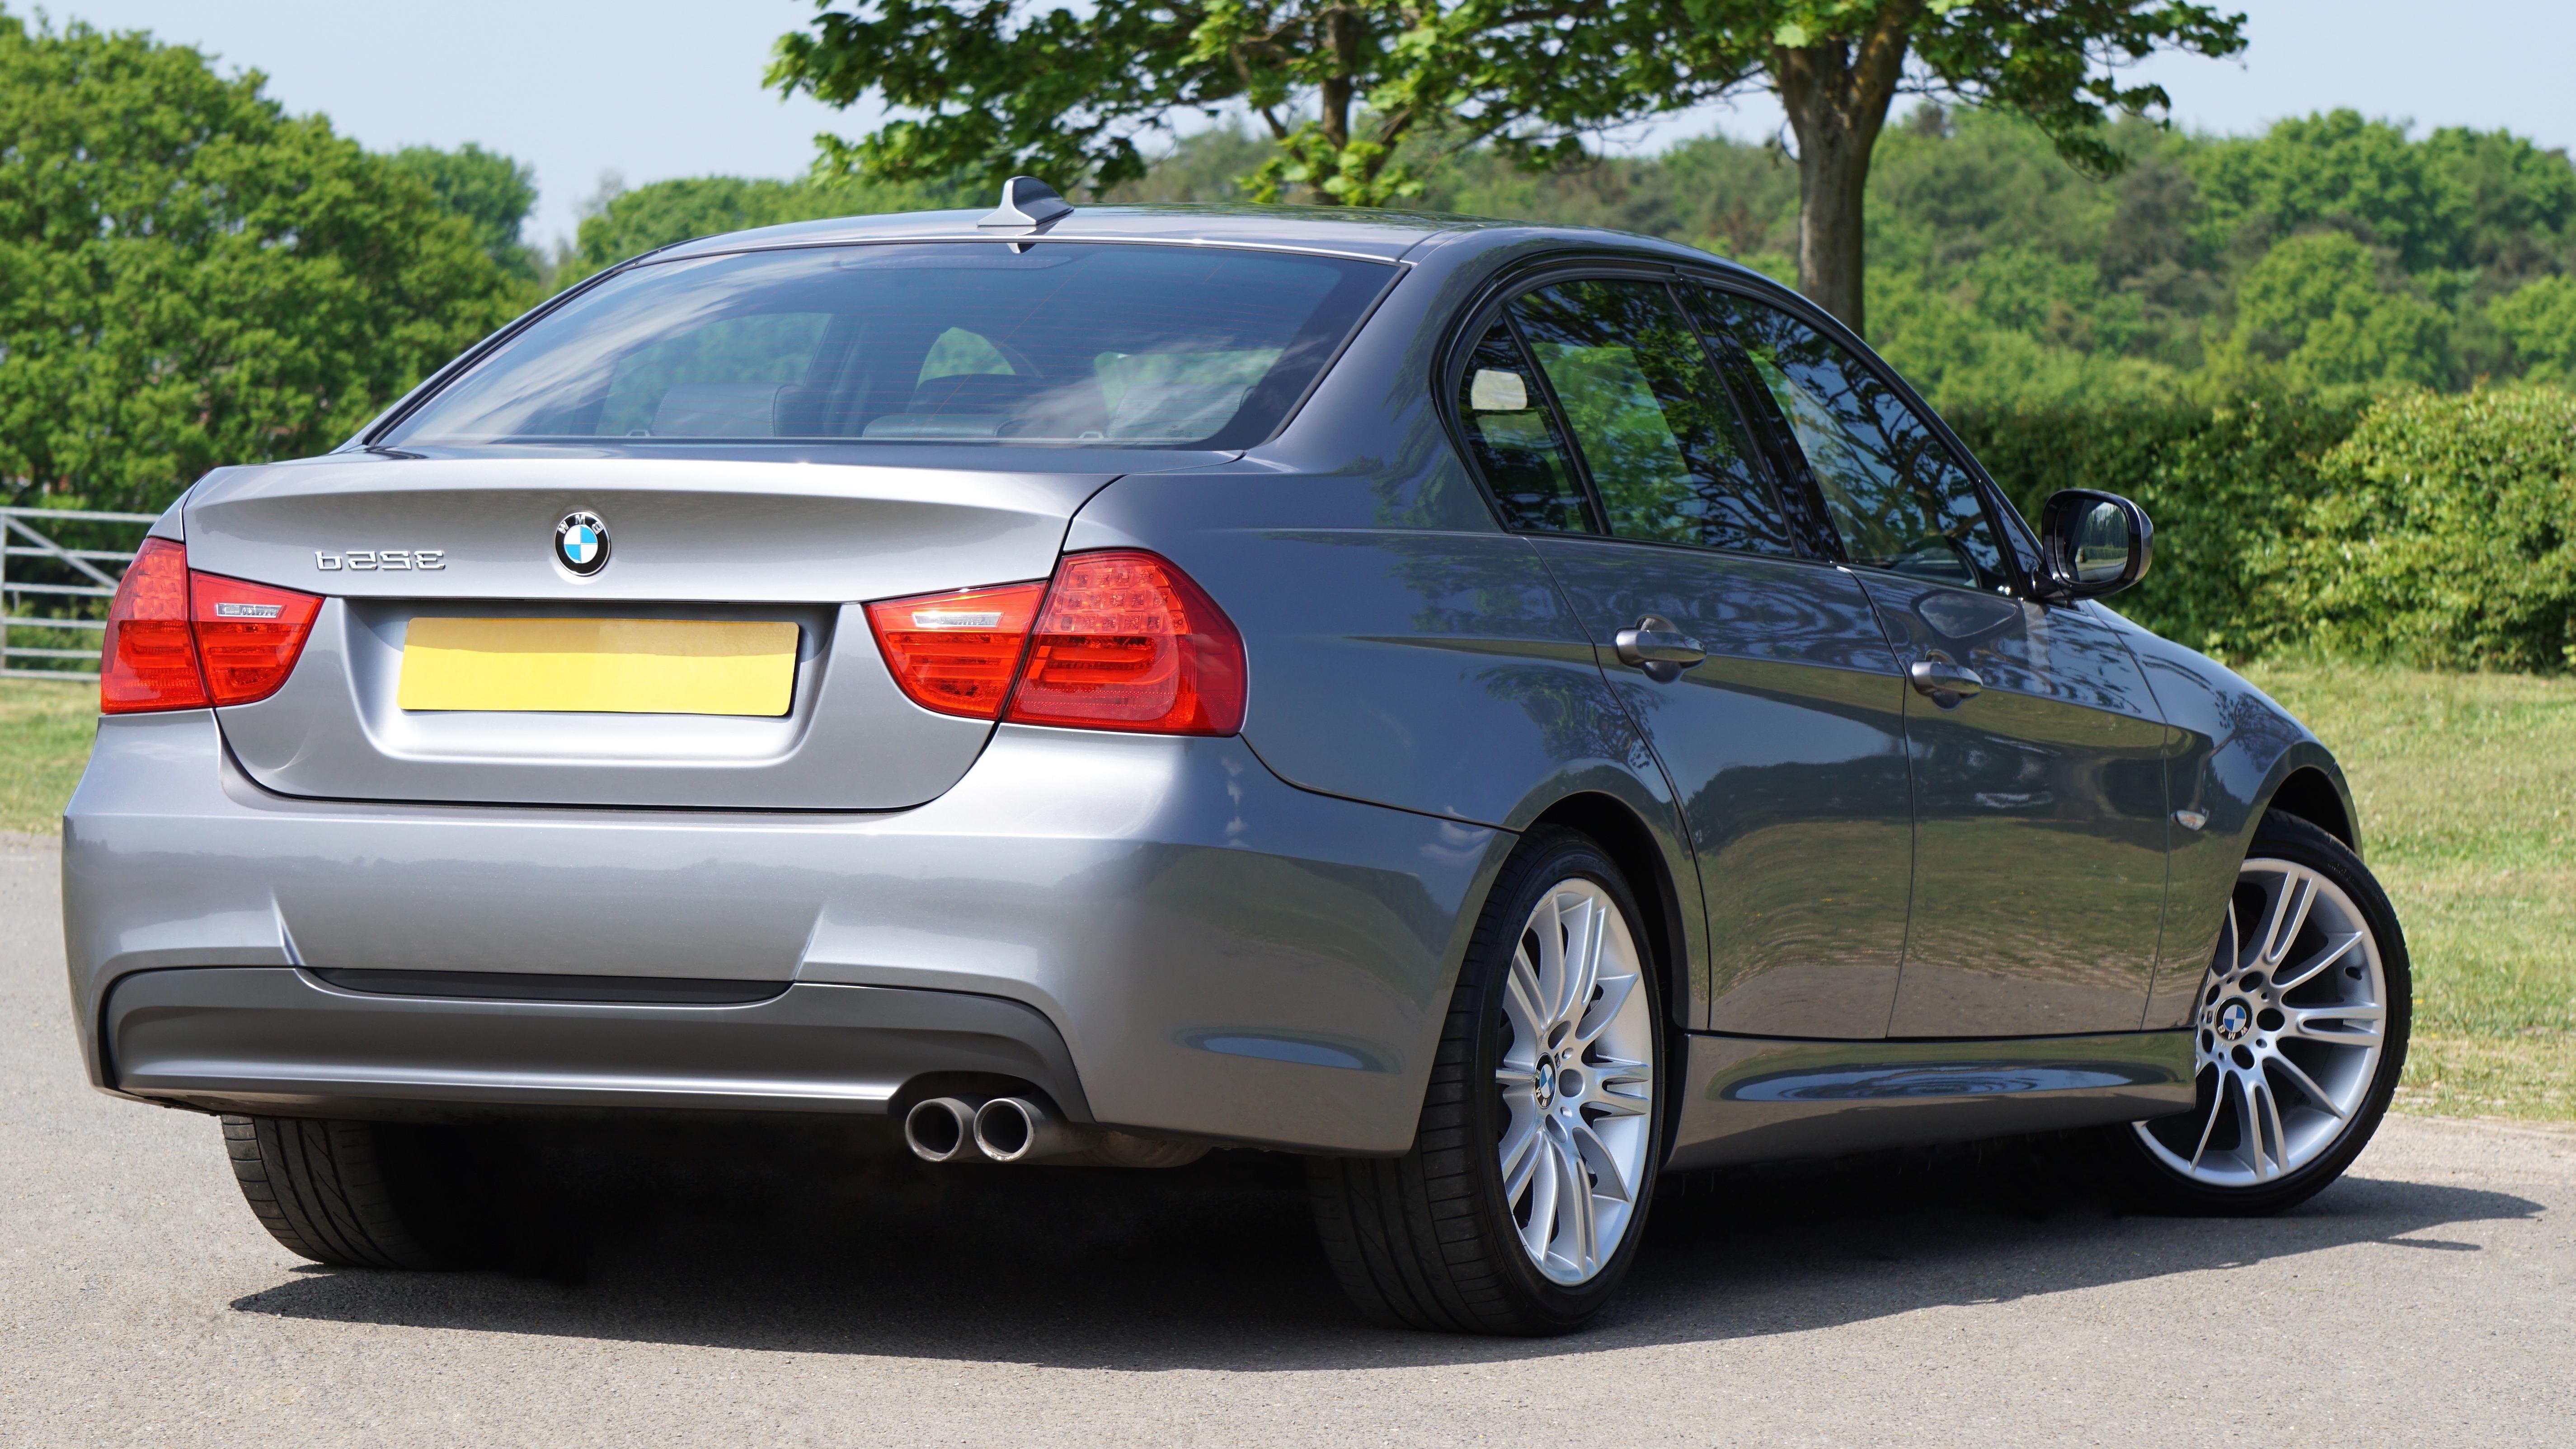 Free picture: car, vehicle, wheel, modern, luxury, engine ...